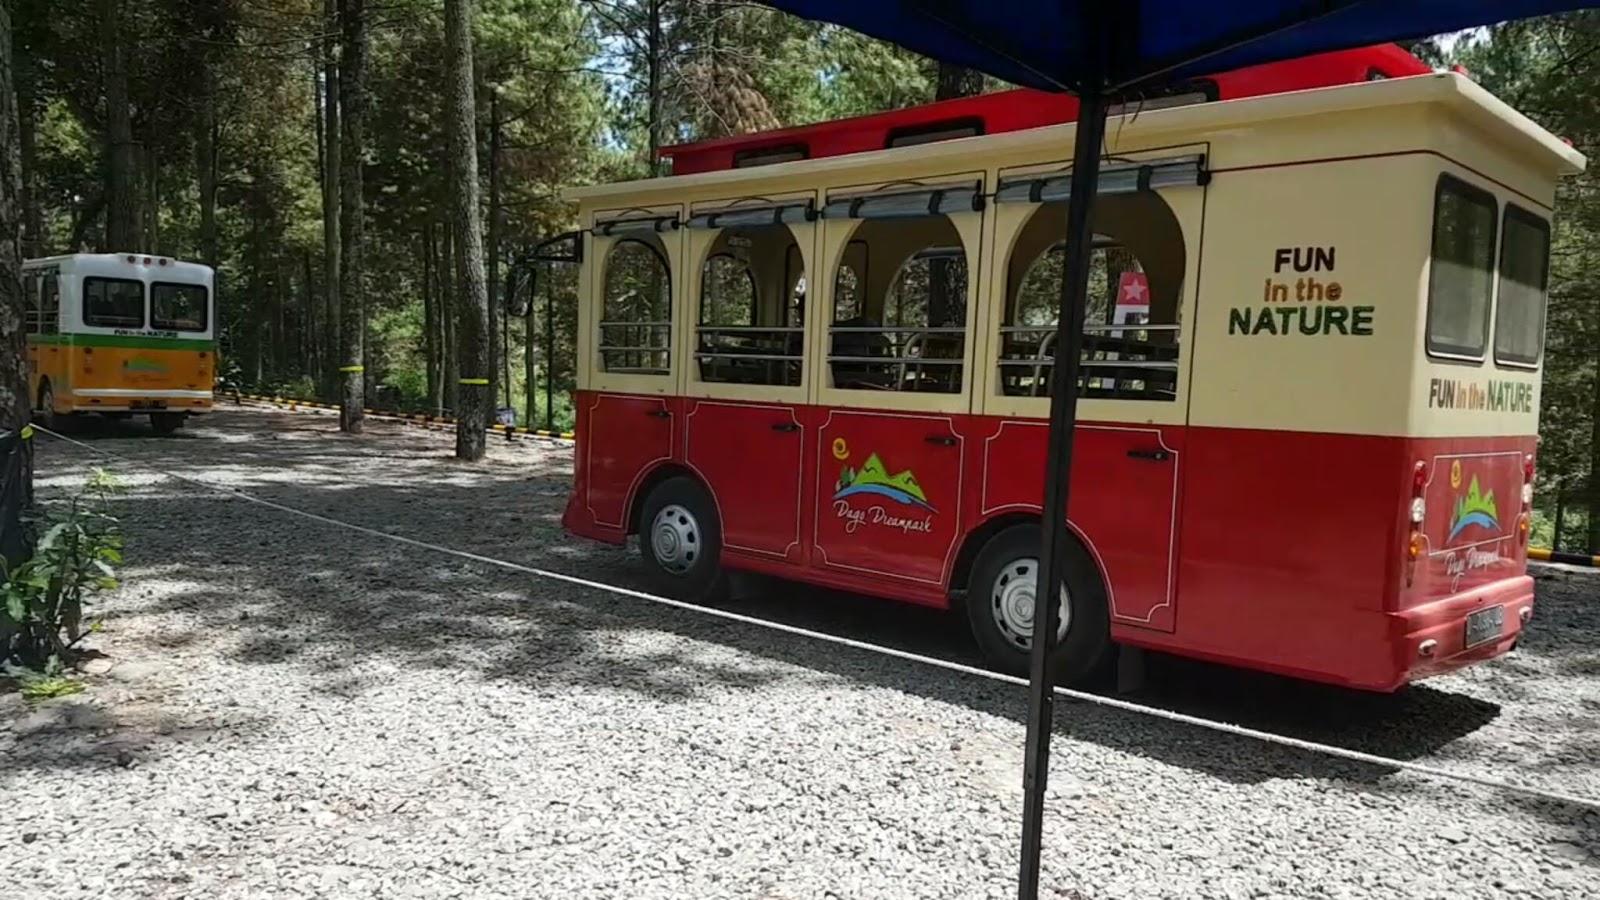 Wisata Keluarga Di Dago Dream Park Bandung Nyeritain Com